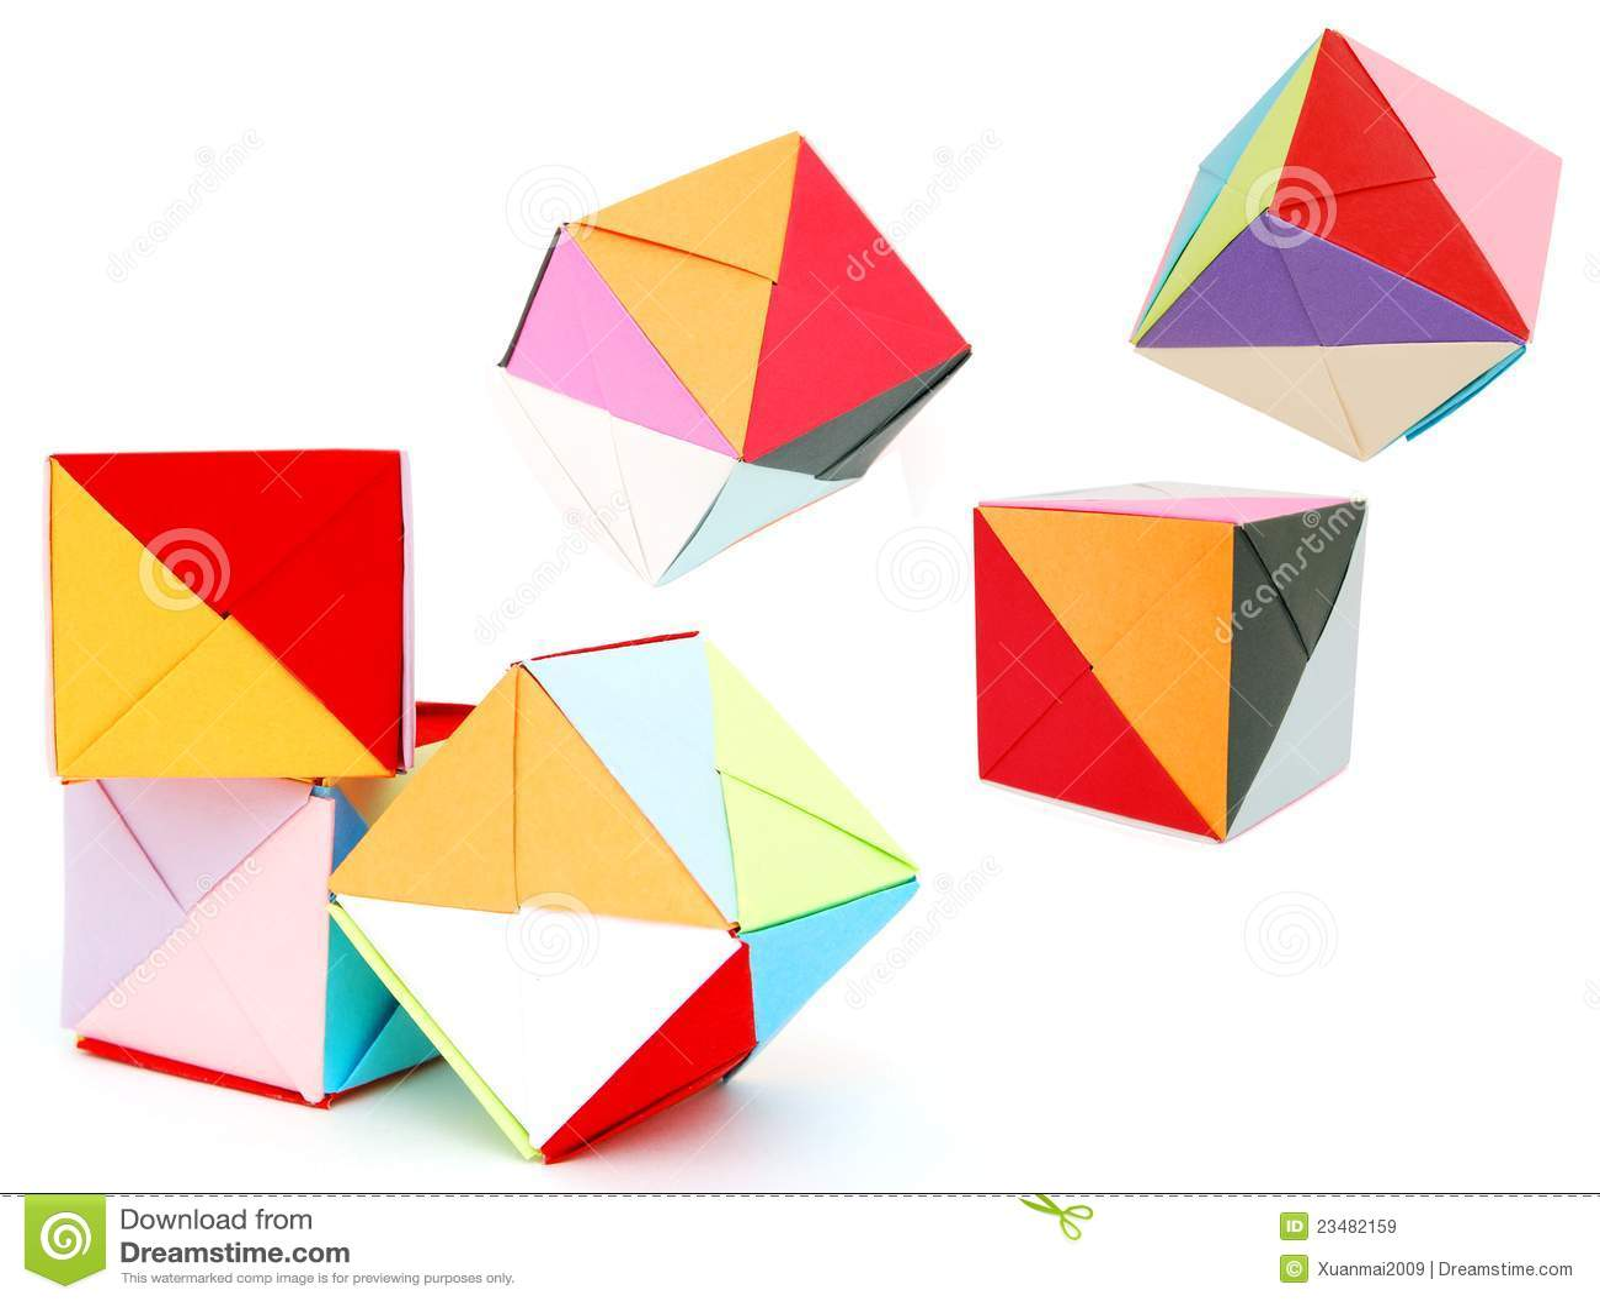 Origami Cube Stock Image Image Of Origami Square School 23482159